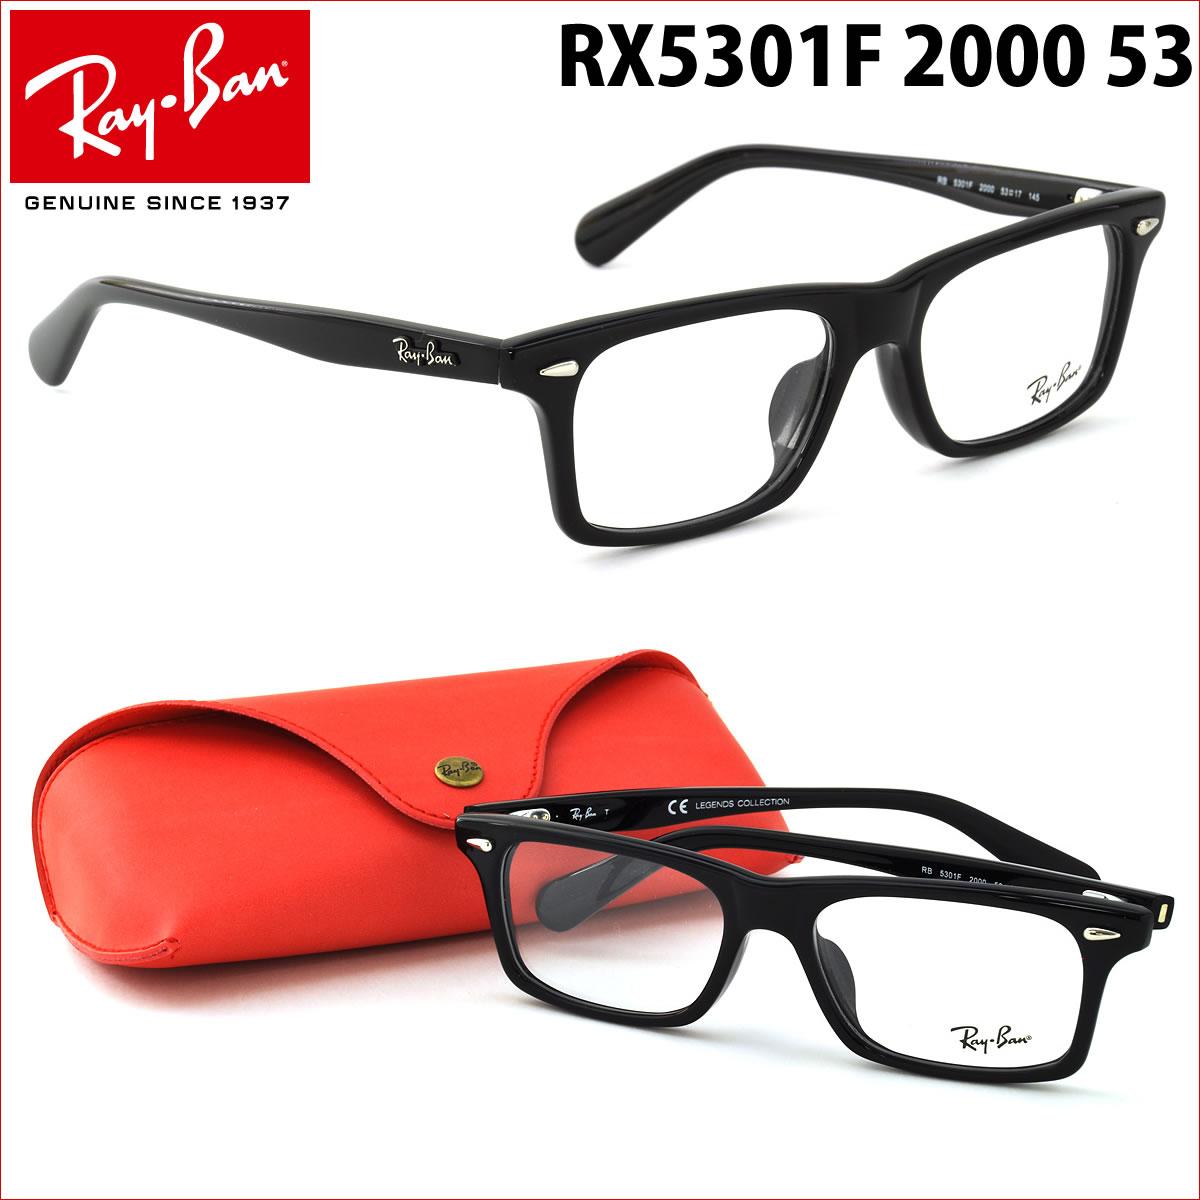 Ray ban sunglasses sale new zealand - Ray Ban Mall New Zealand